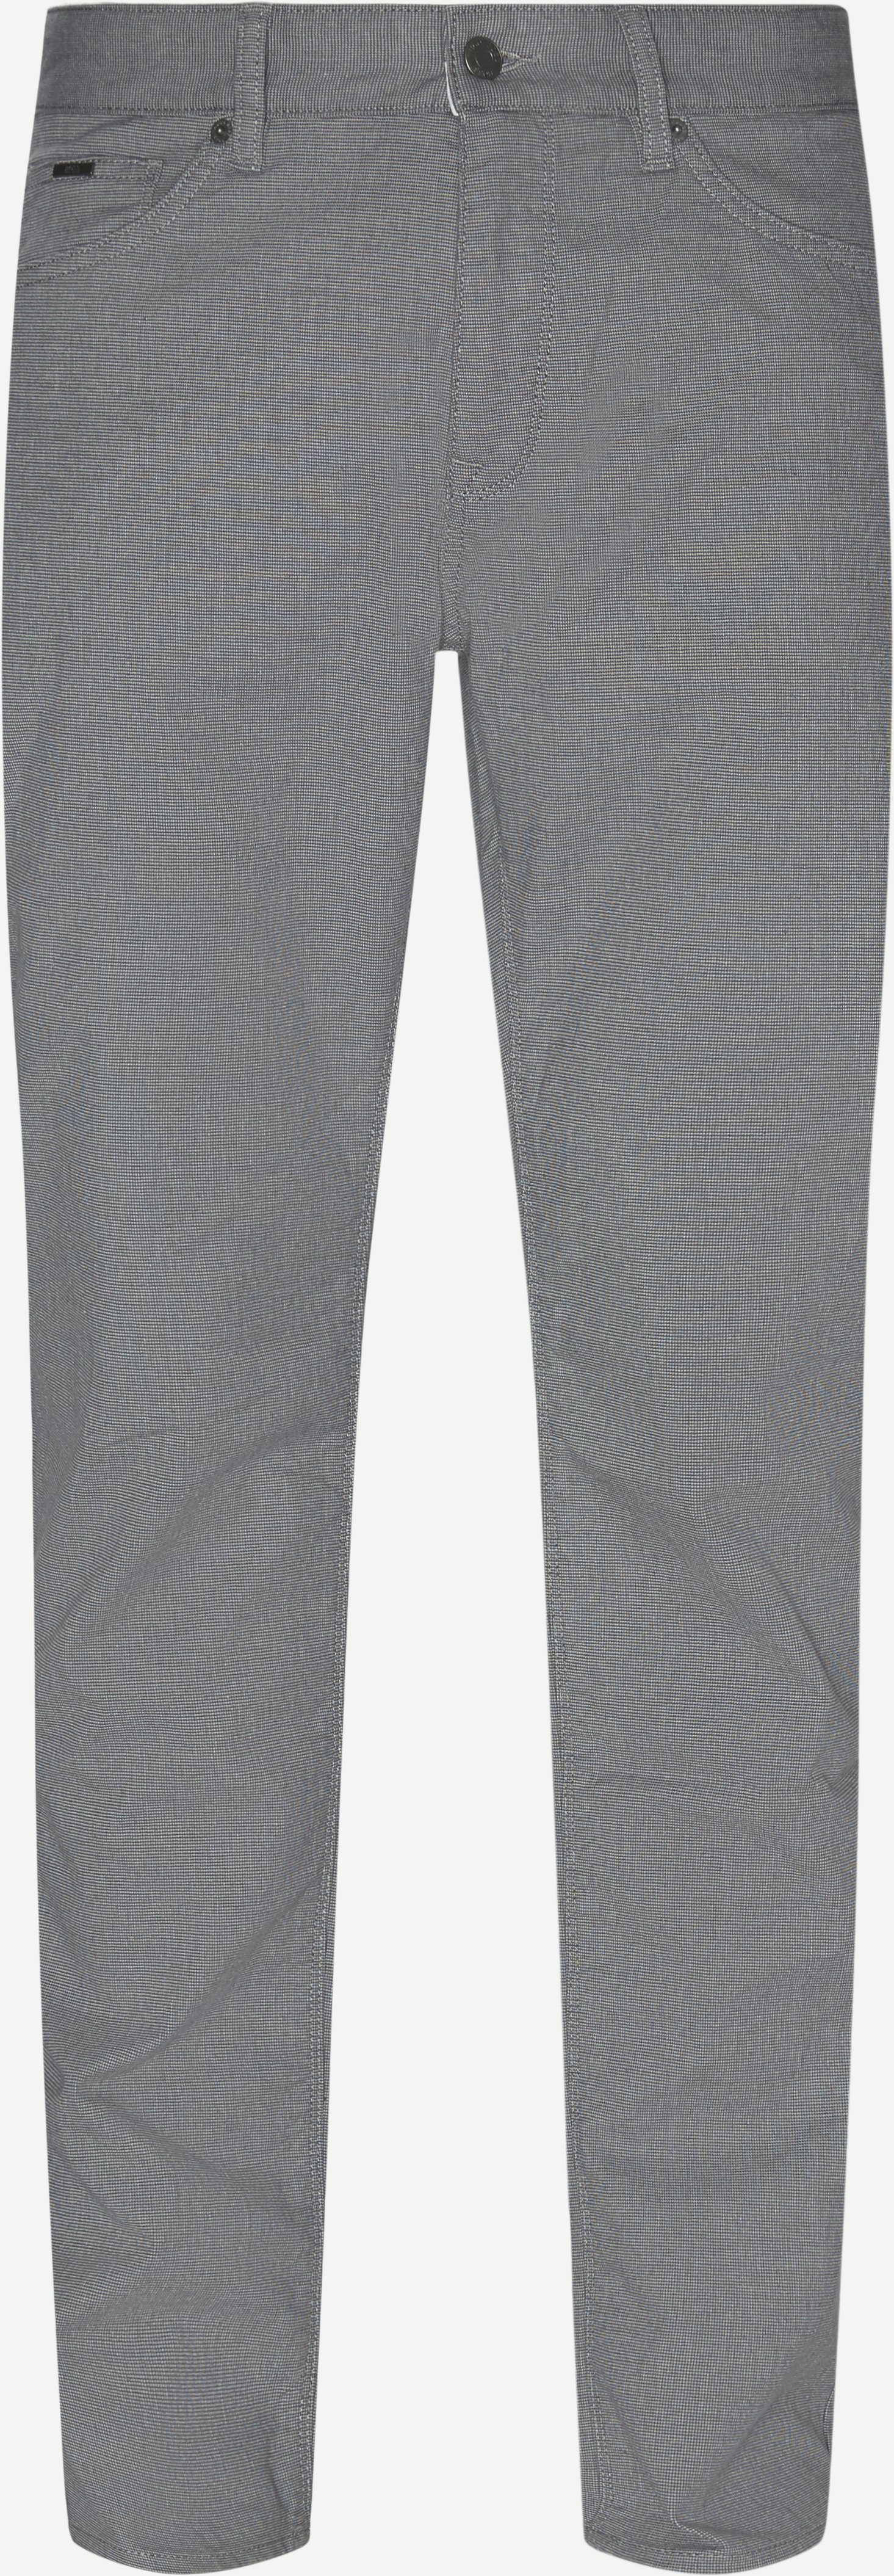 Jeans - Regular - Grå